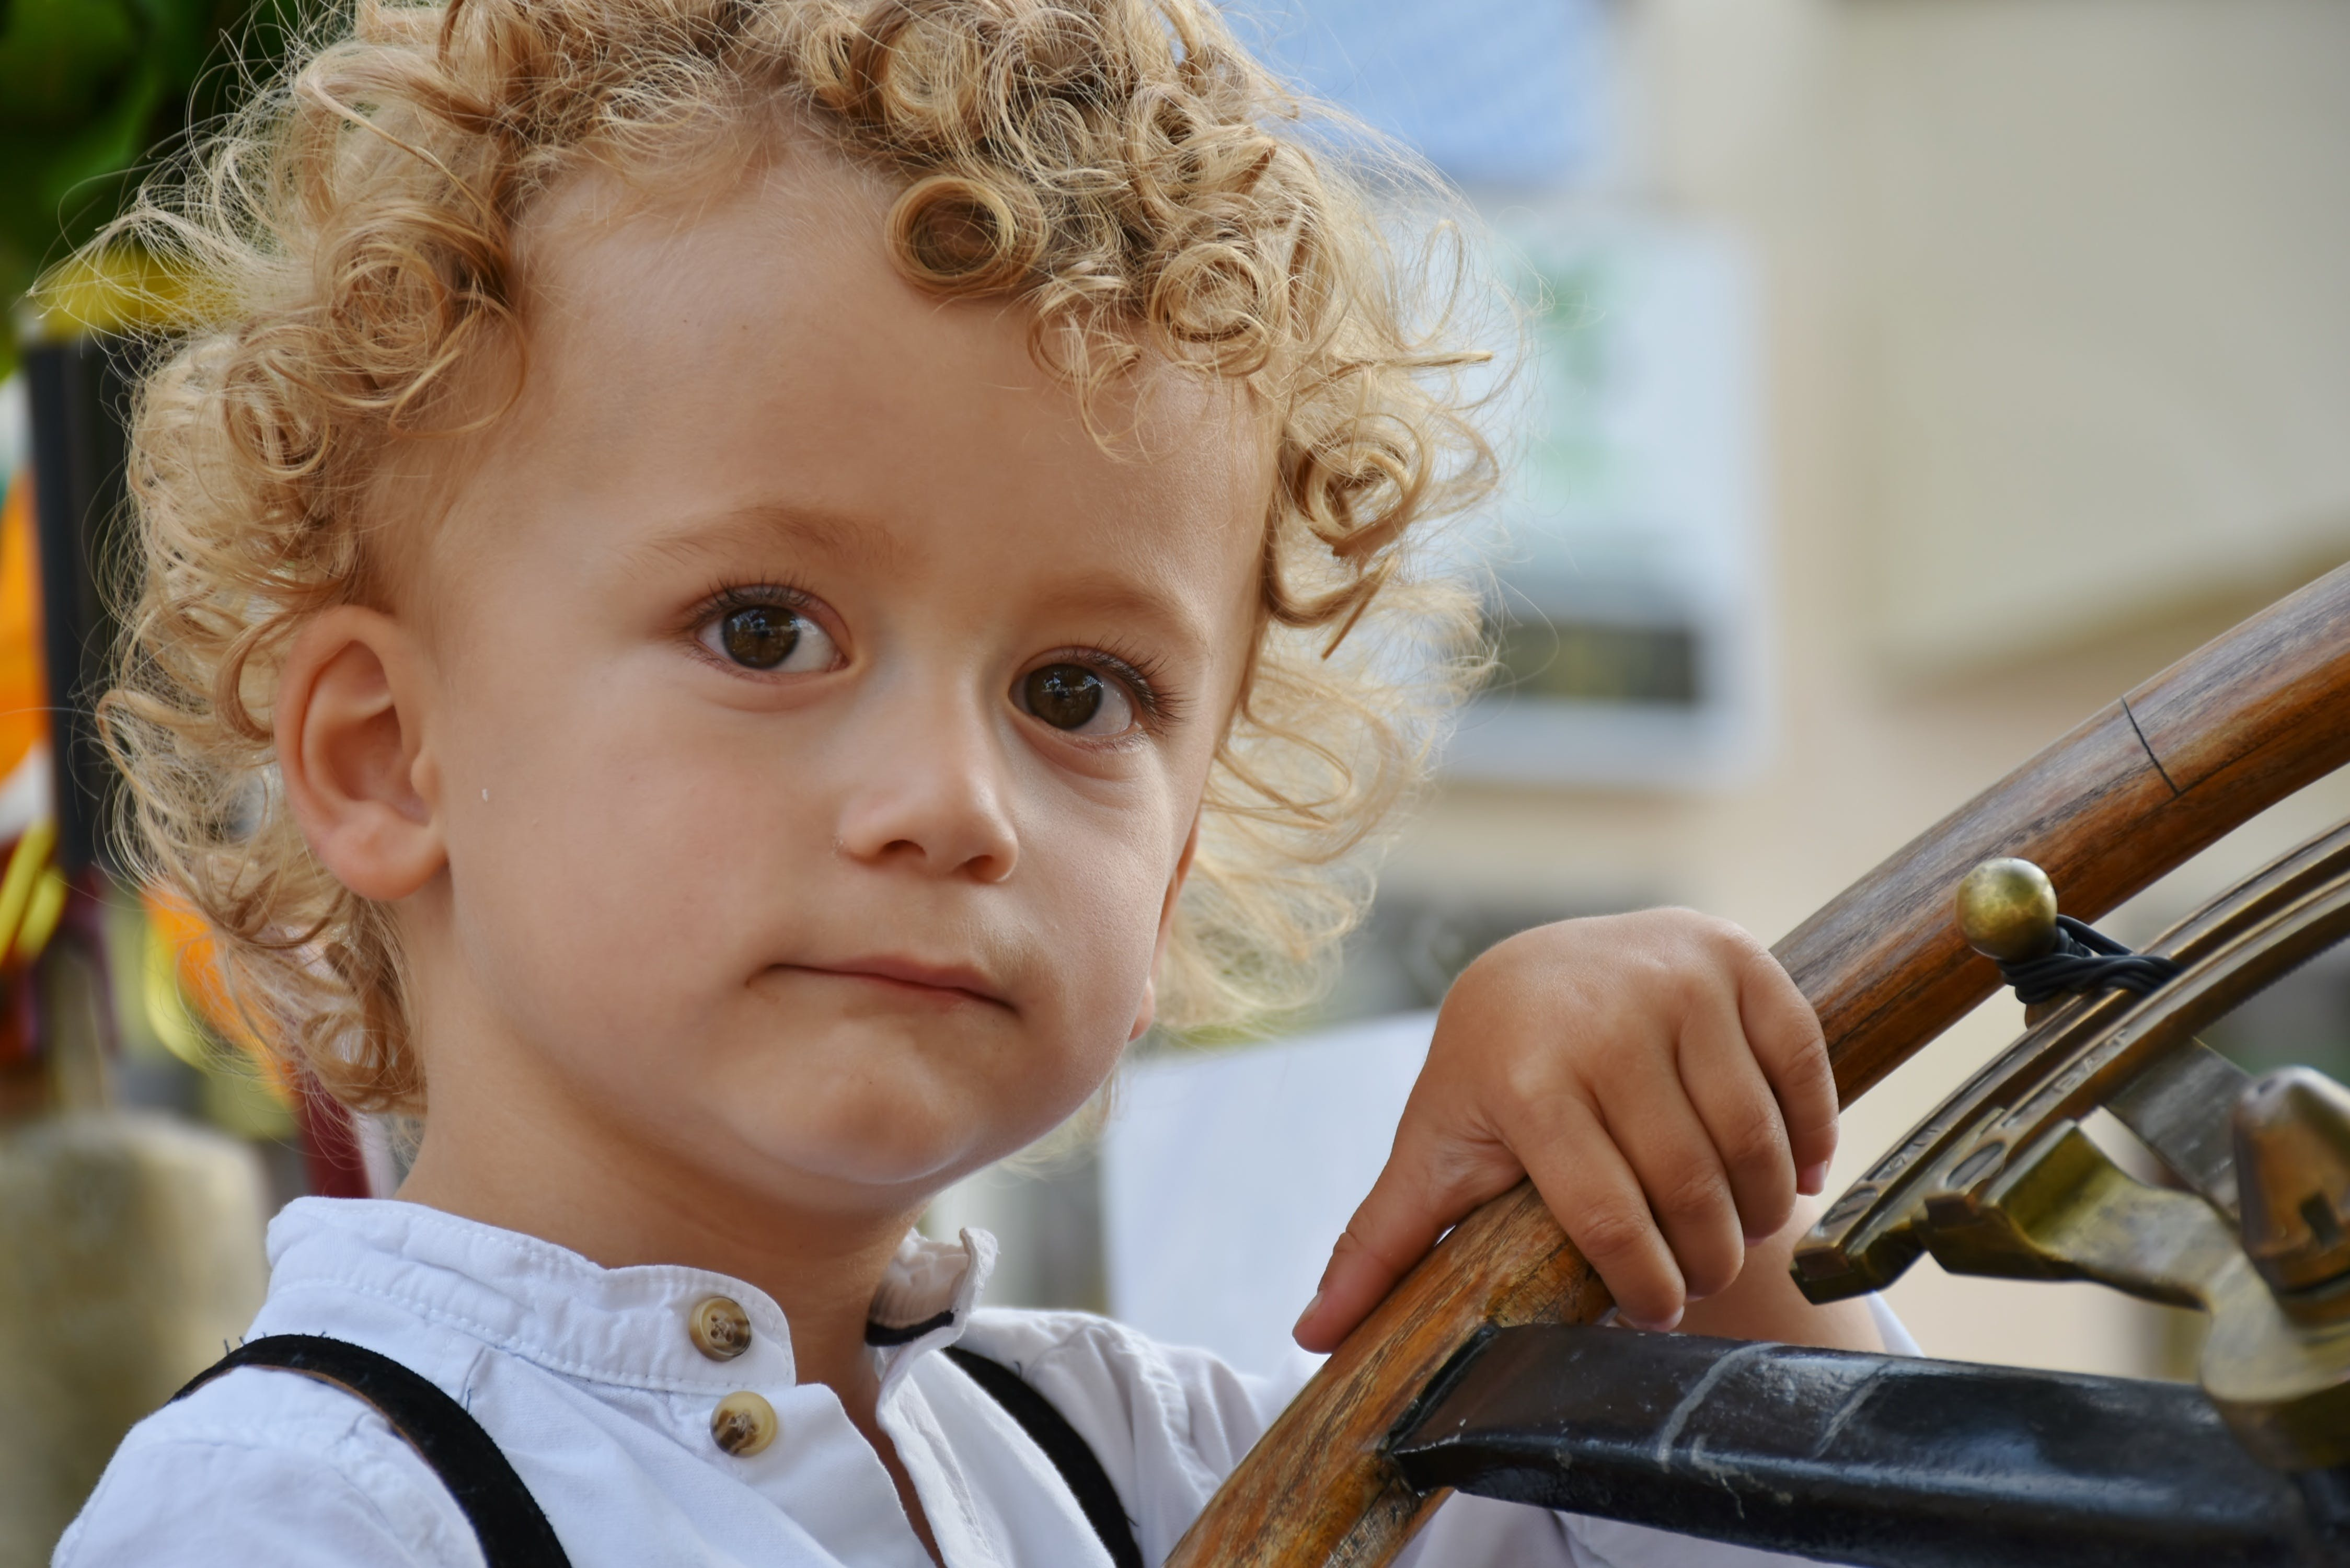 Free stock photo of blond, boy, child, curiosity